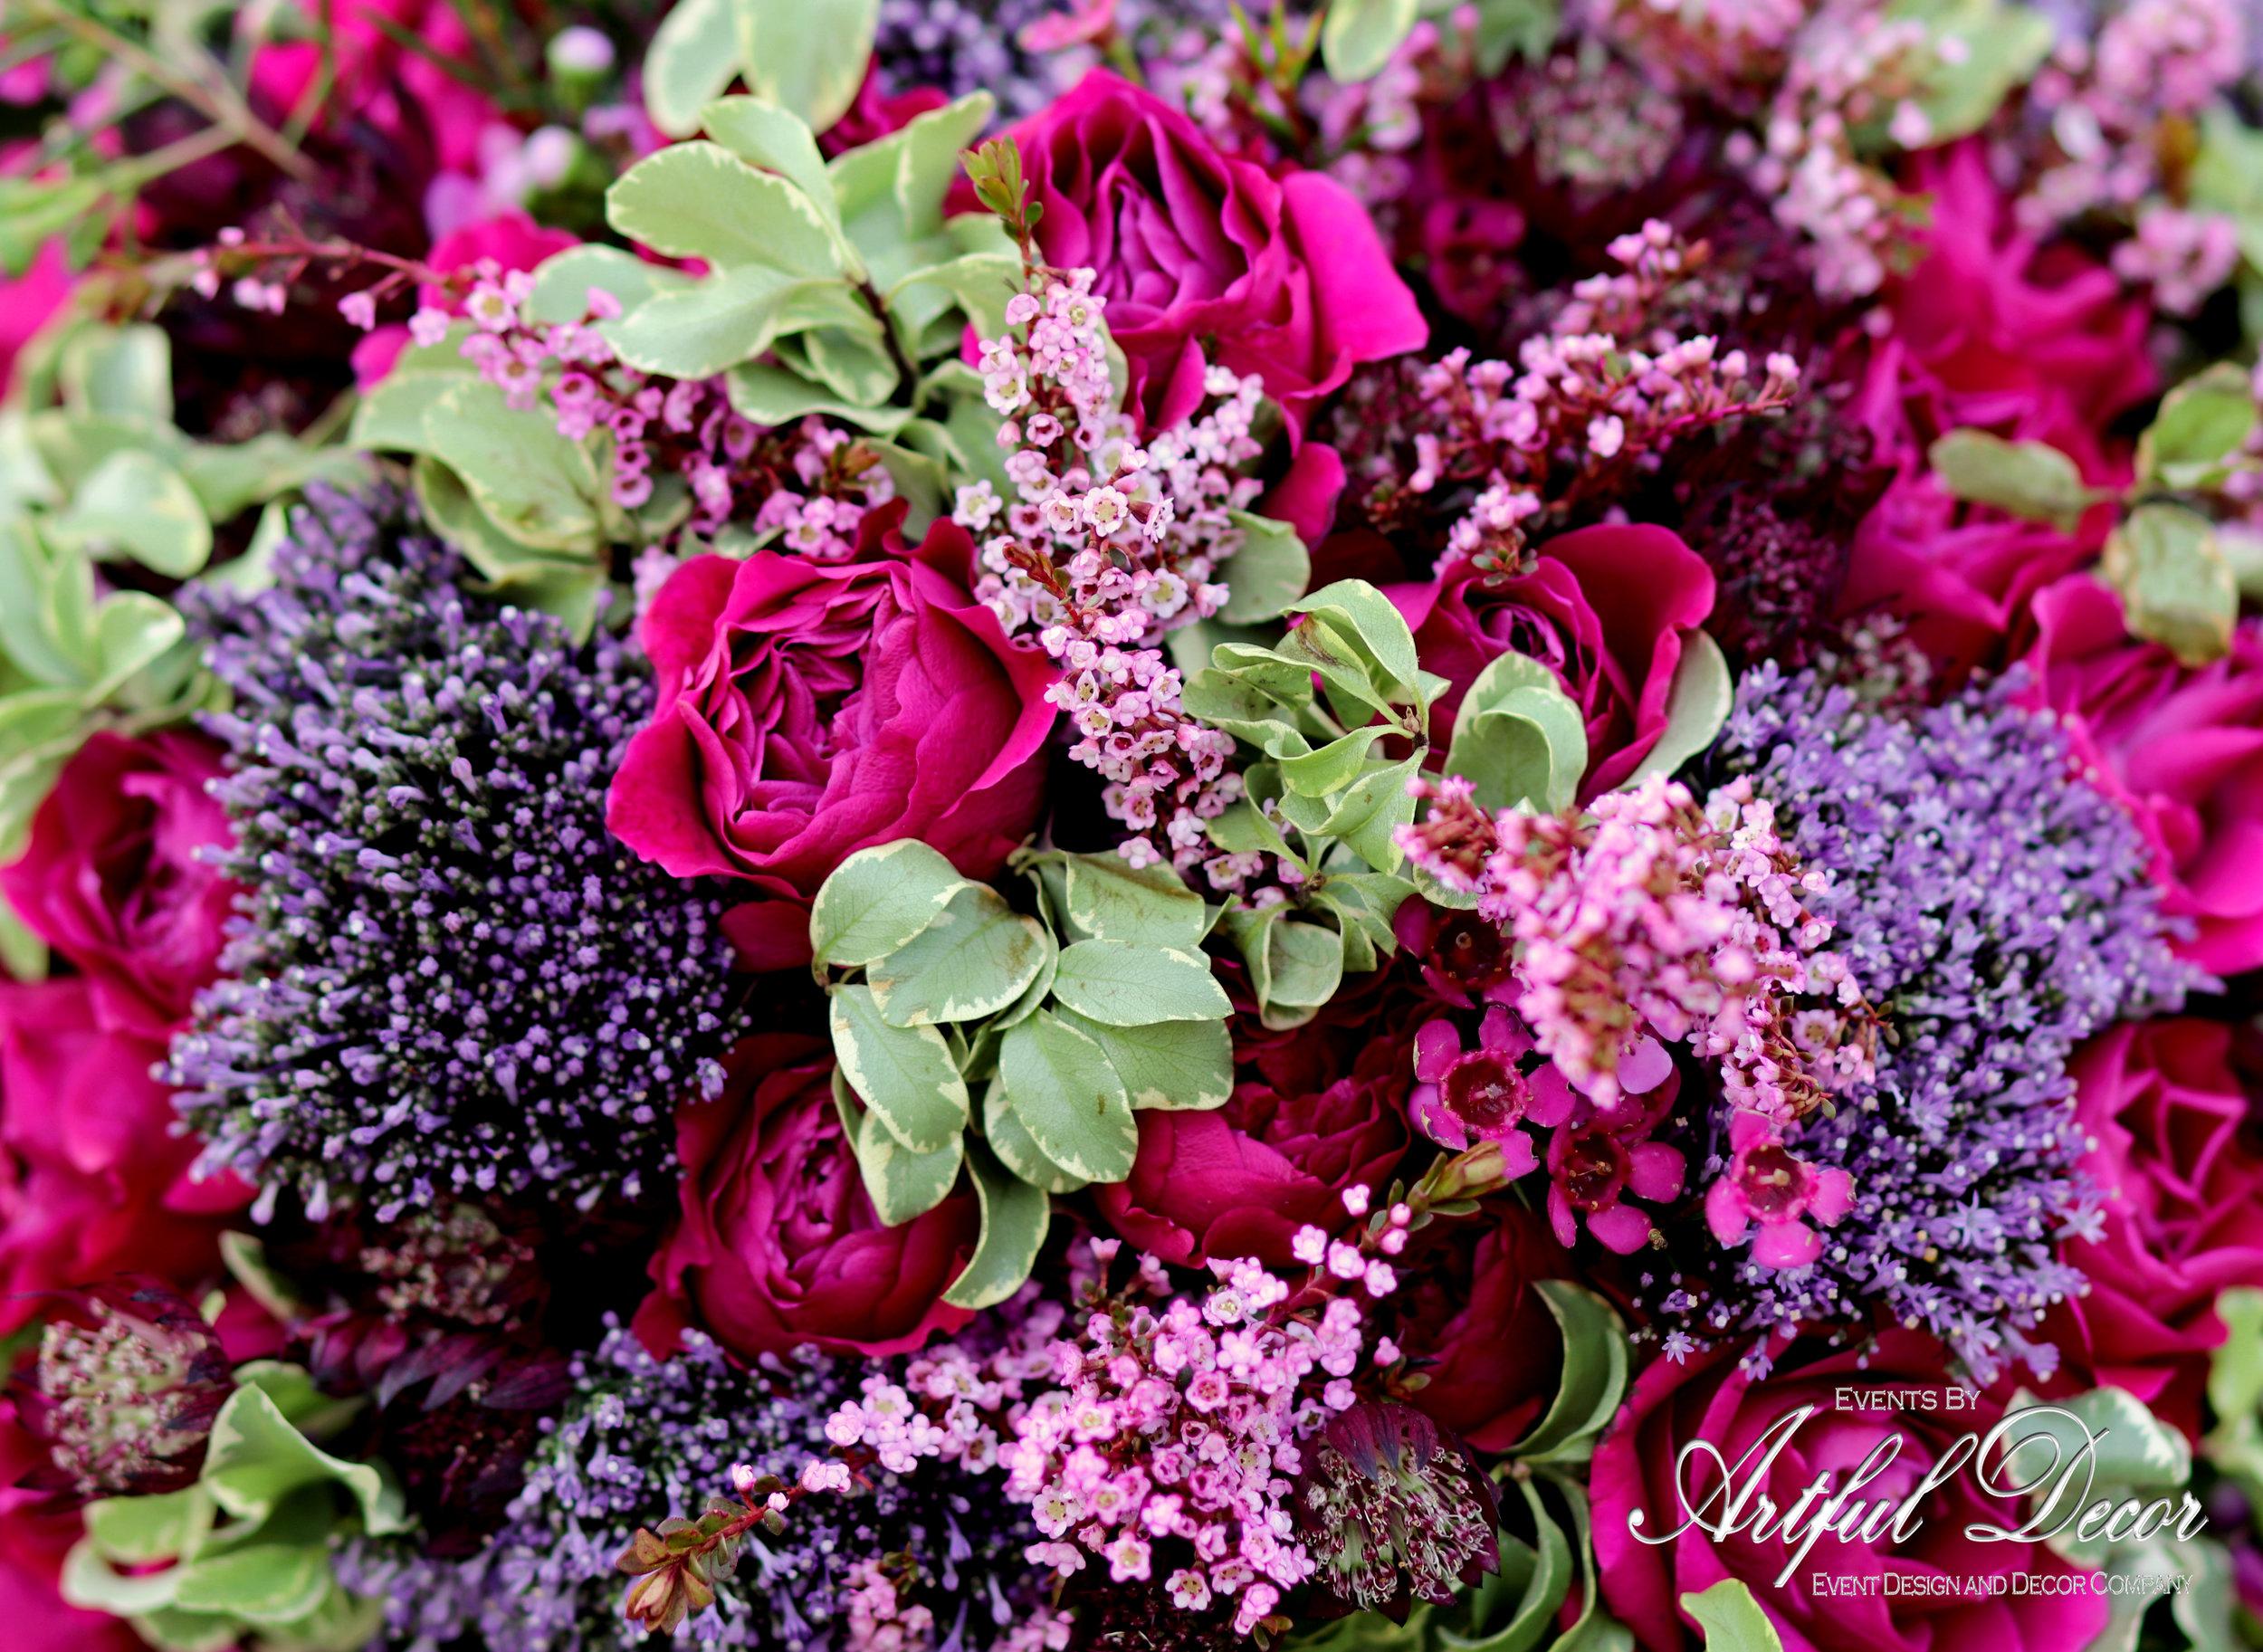 Bouquet 2 Crop Copyright.jpg